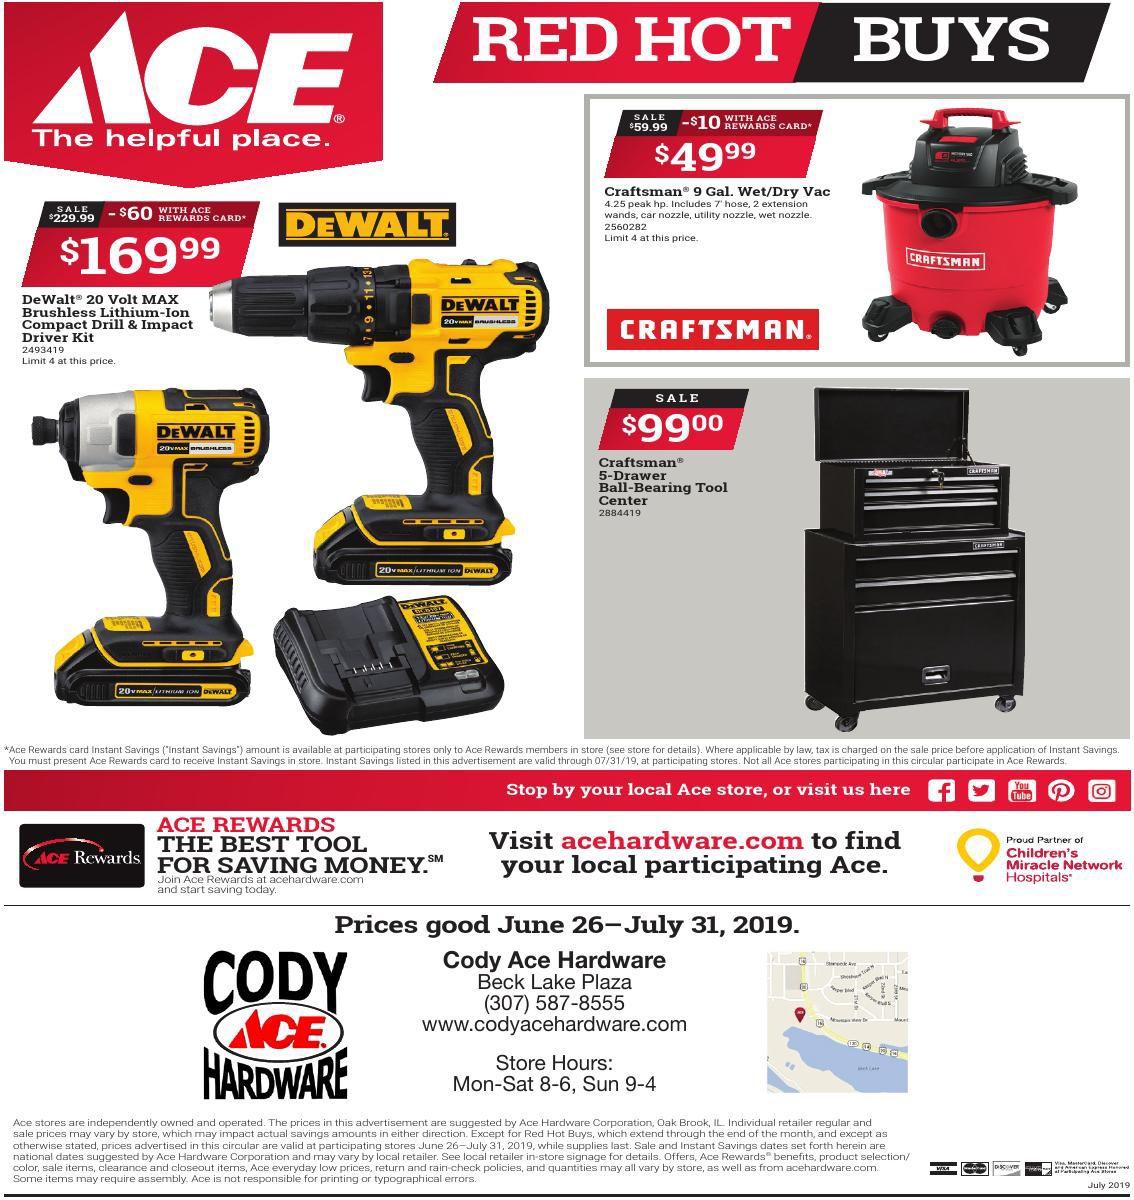 010122_ace_hardware_rustler_shopping